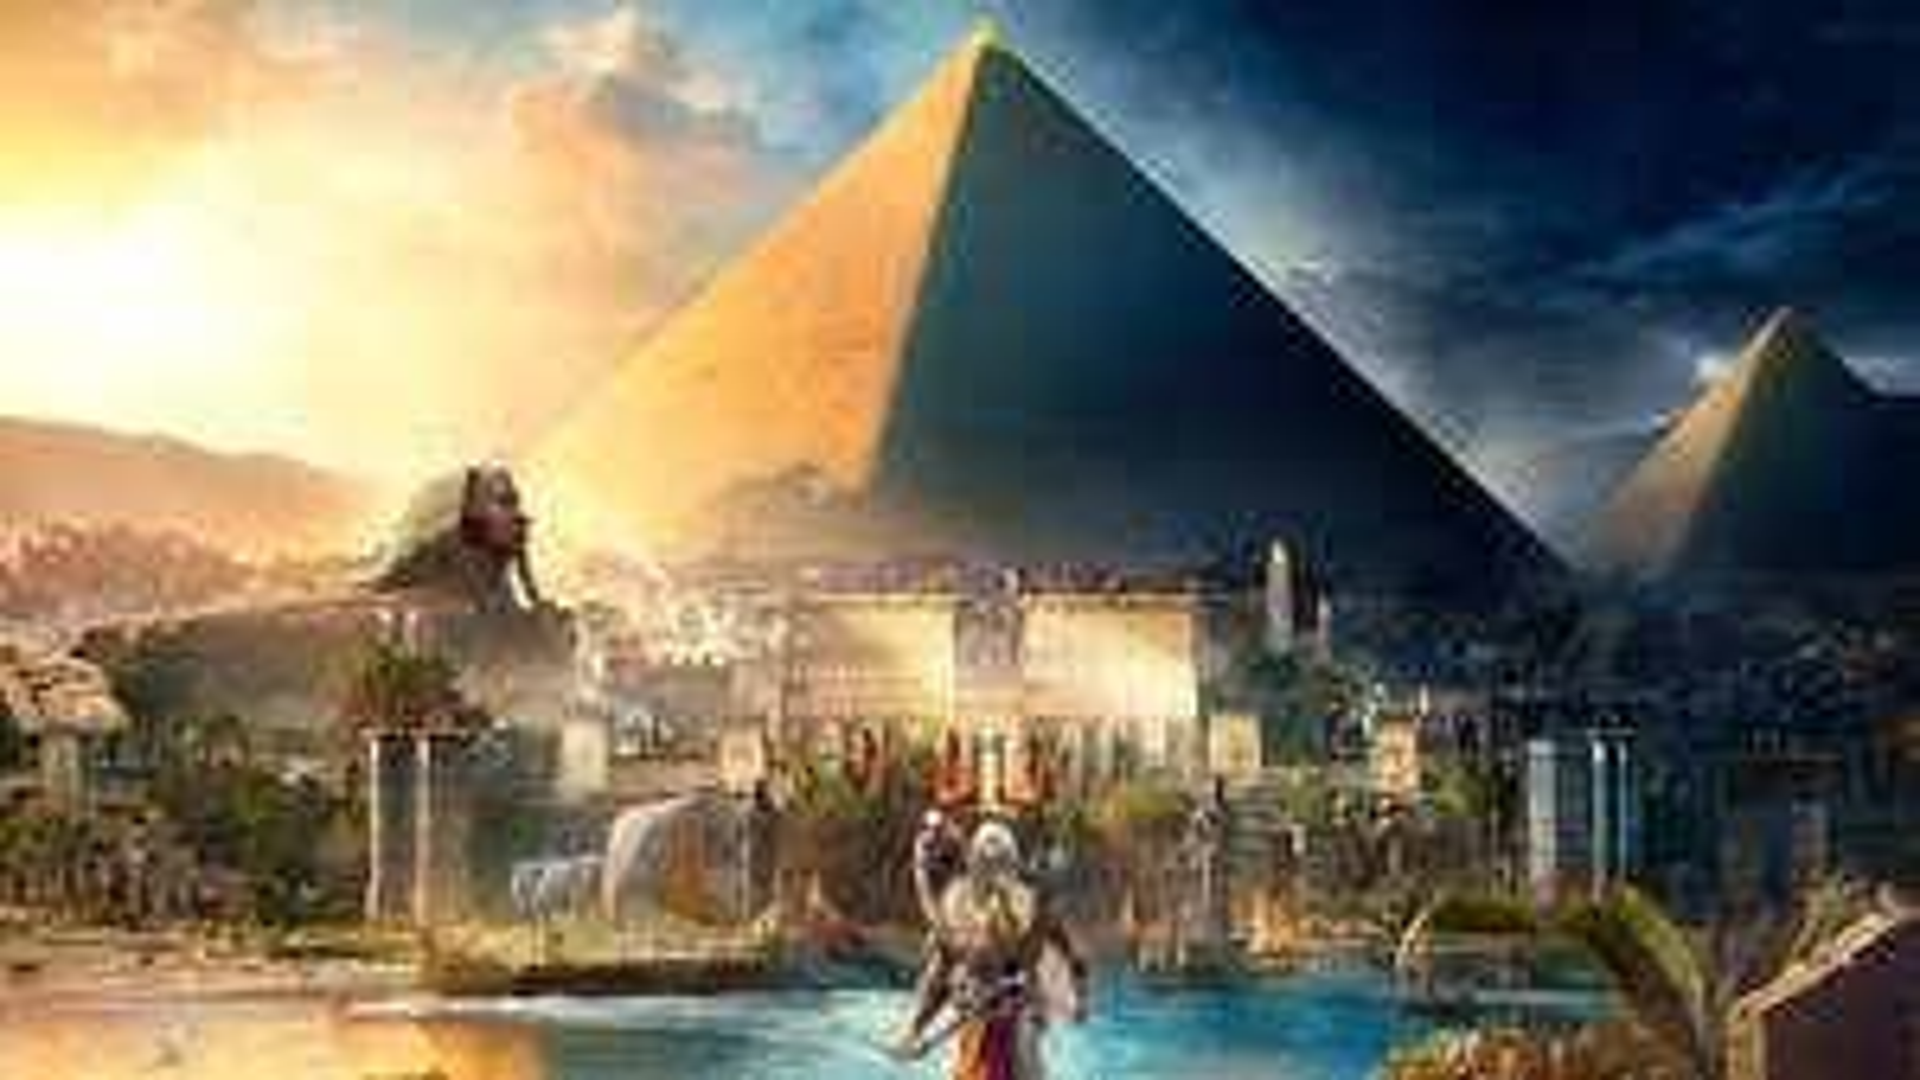 Assassin's Creed Origins oraz inne gry na PC Neonet Lokalnie sklepy. Akcja Ogólnopolska.